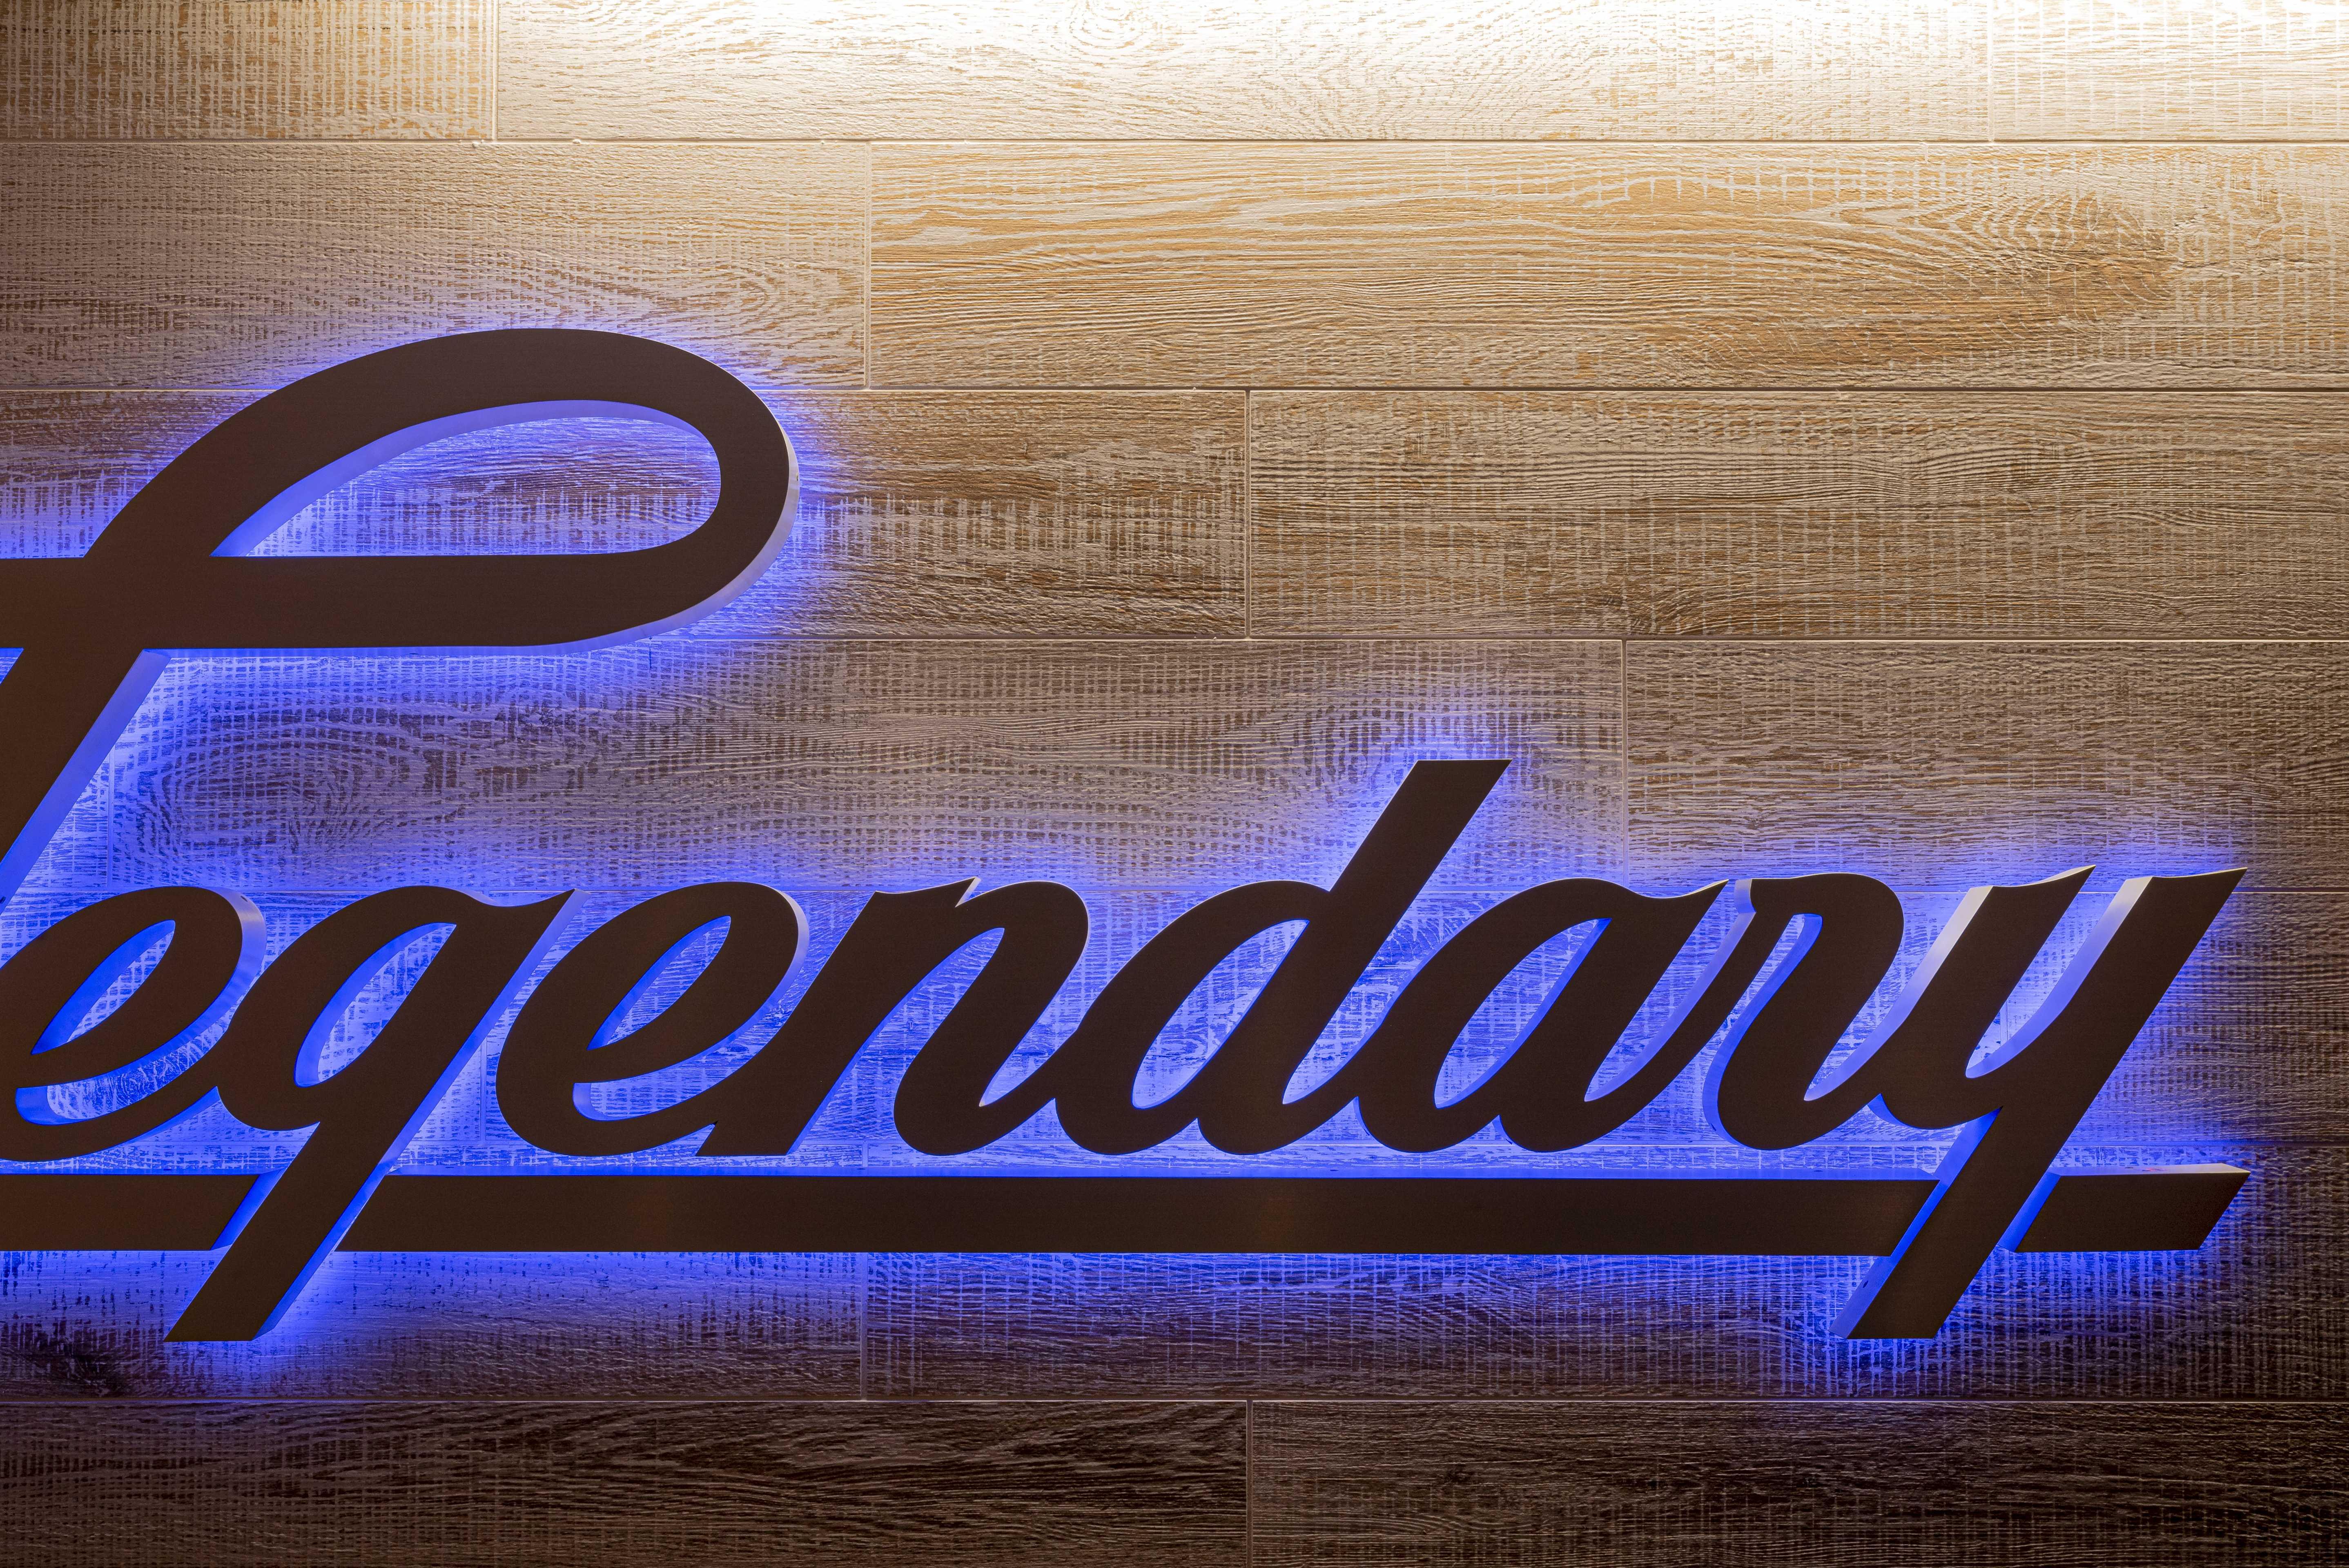 texas-roadhouse-office-legendary-sign